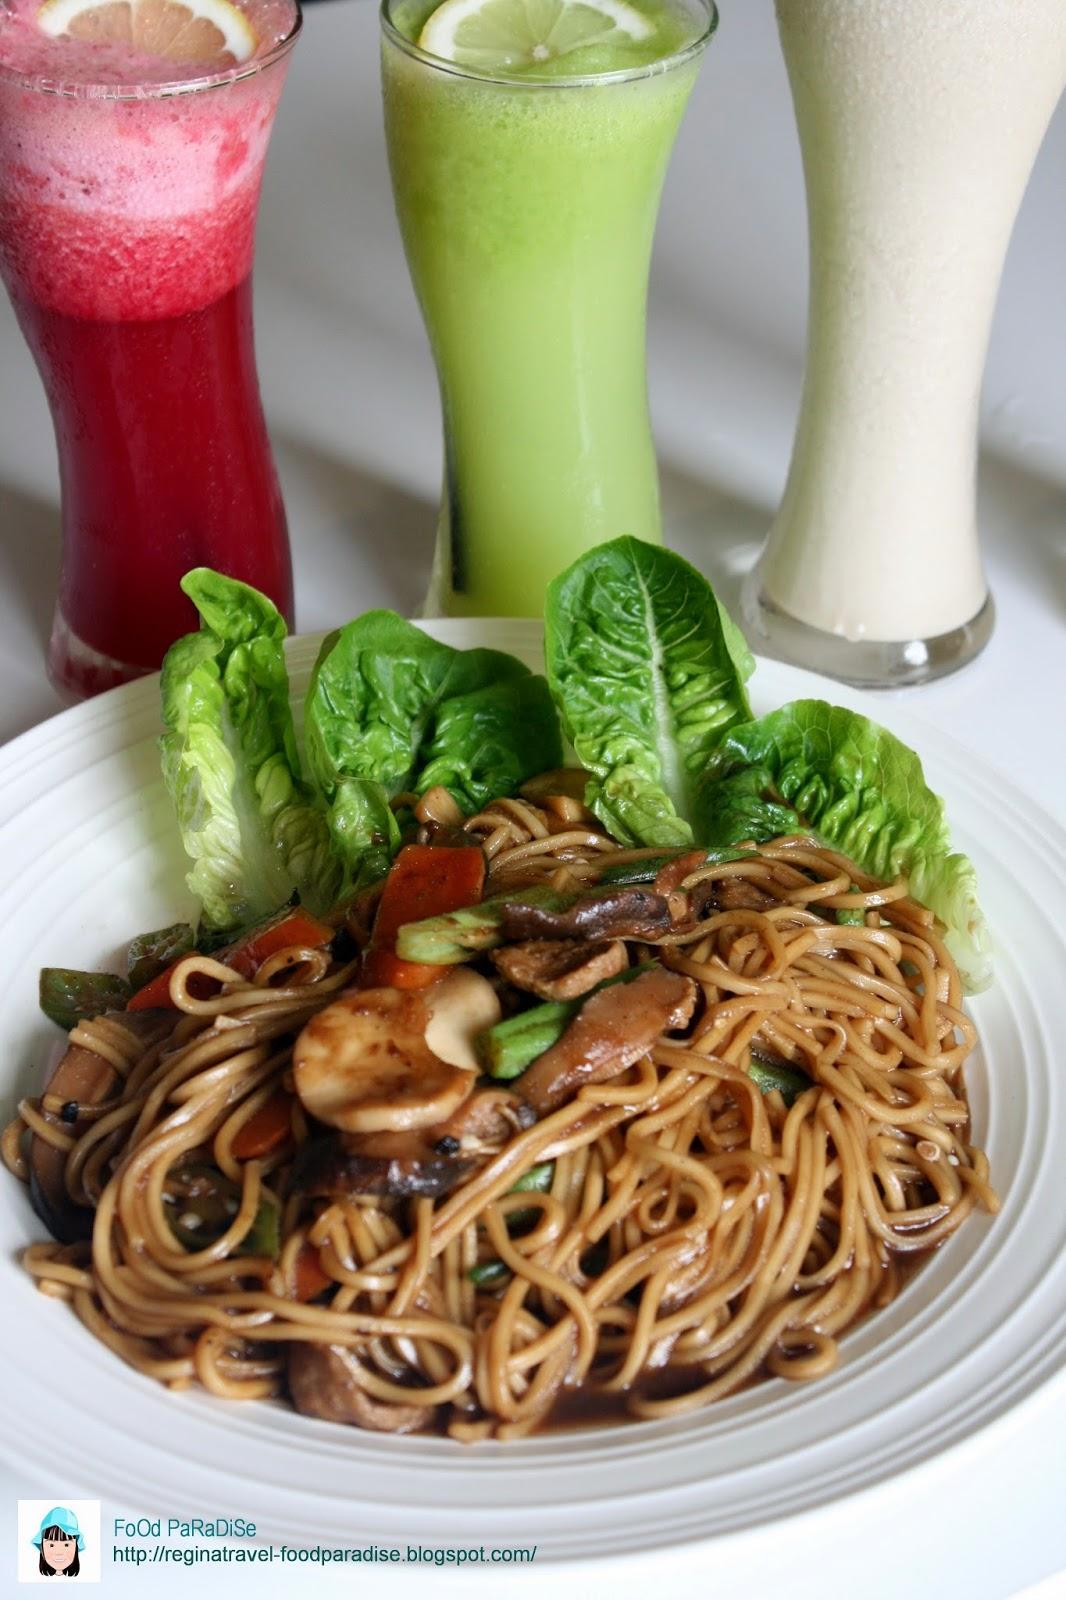 Coya Healthy Cuisine (古雅料理)